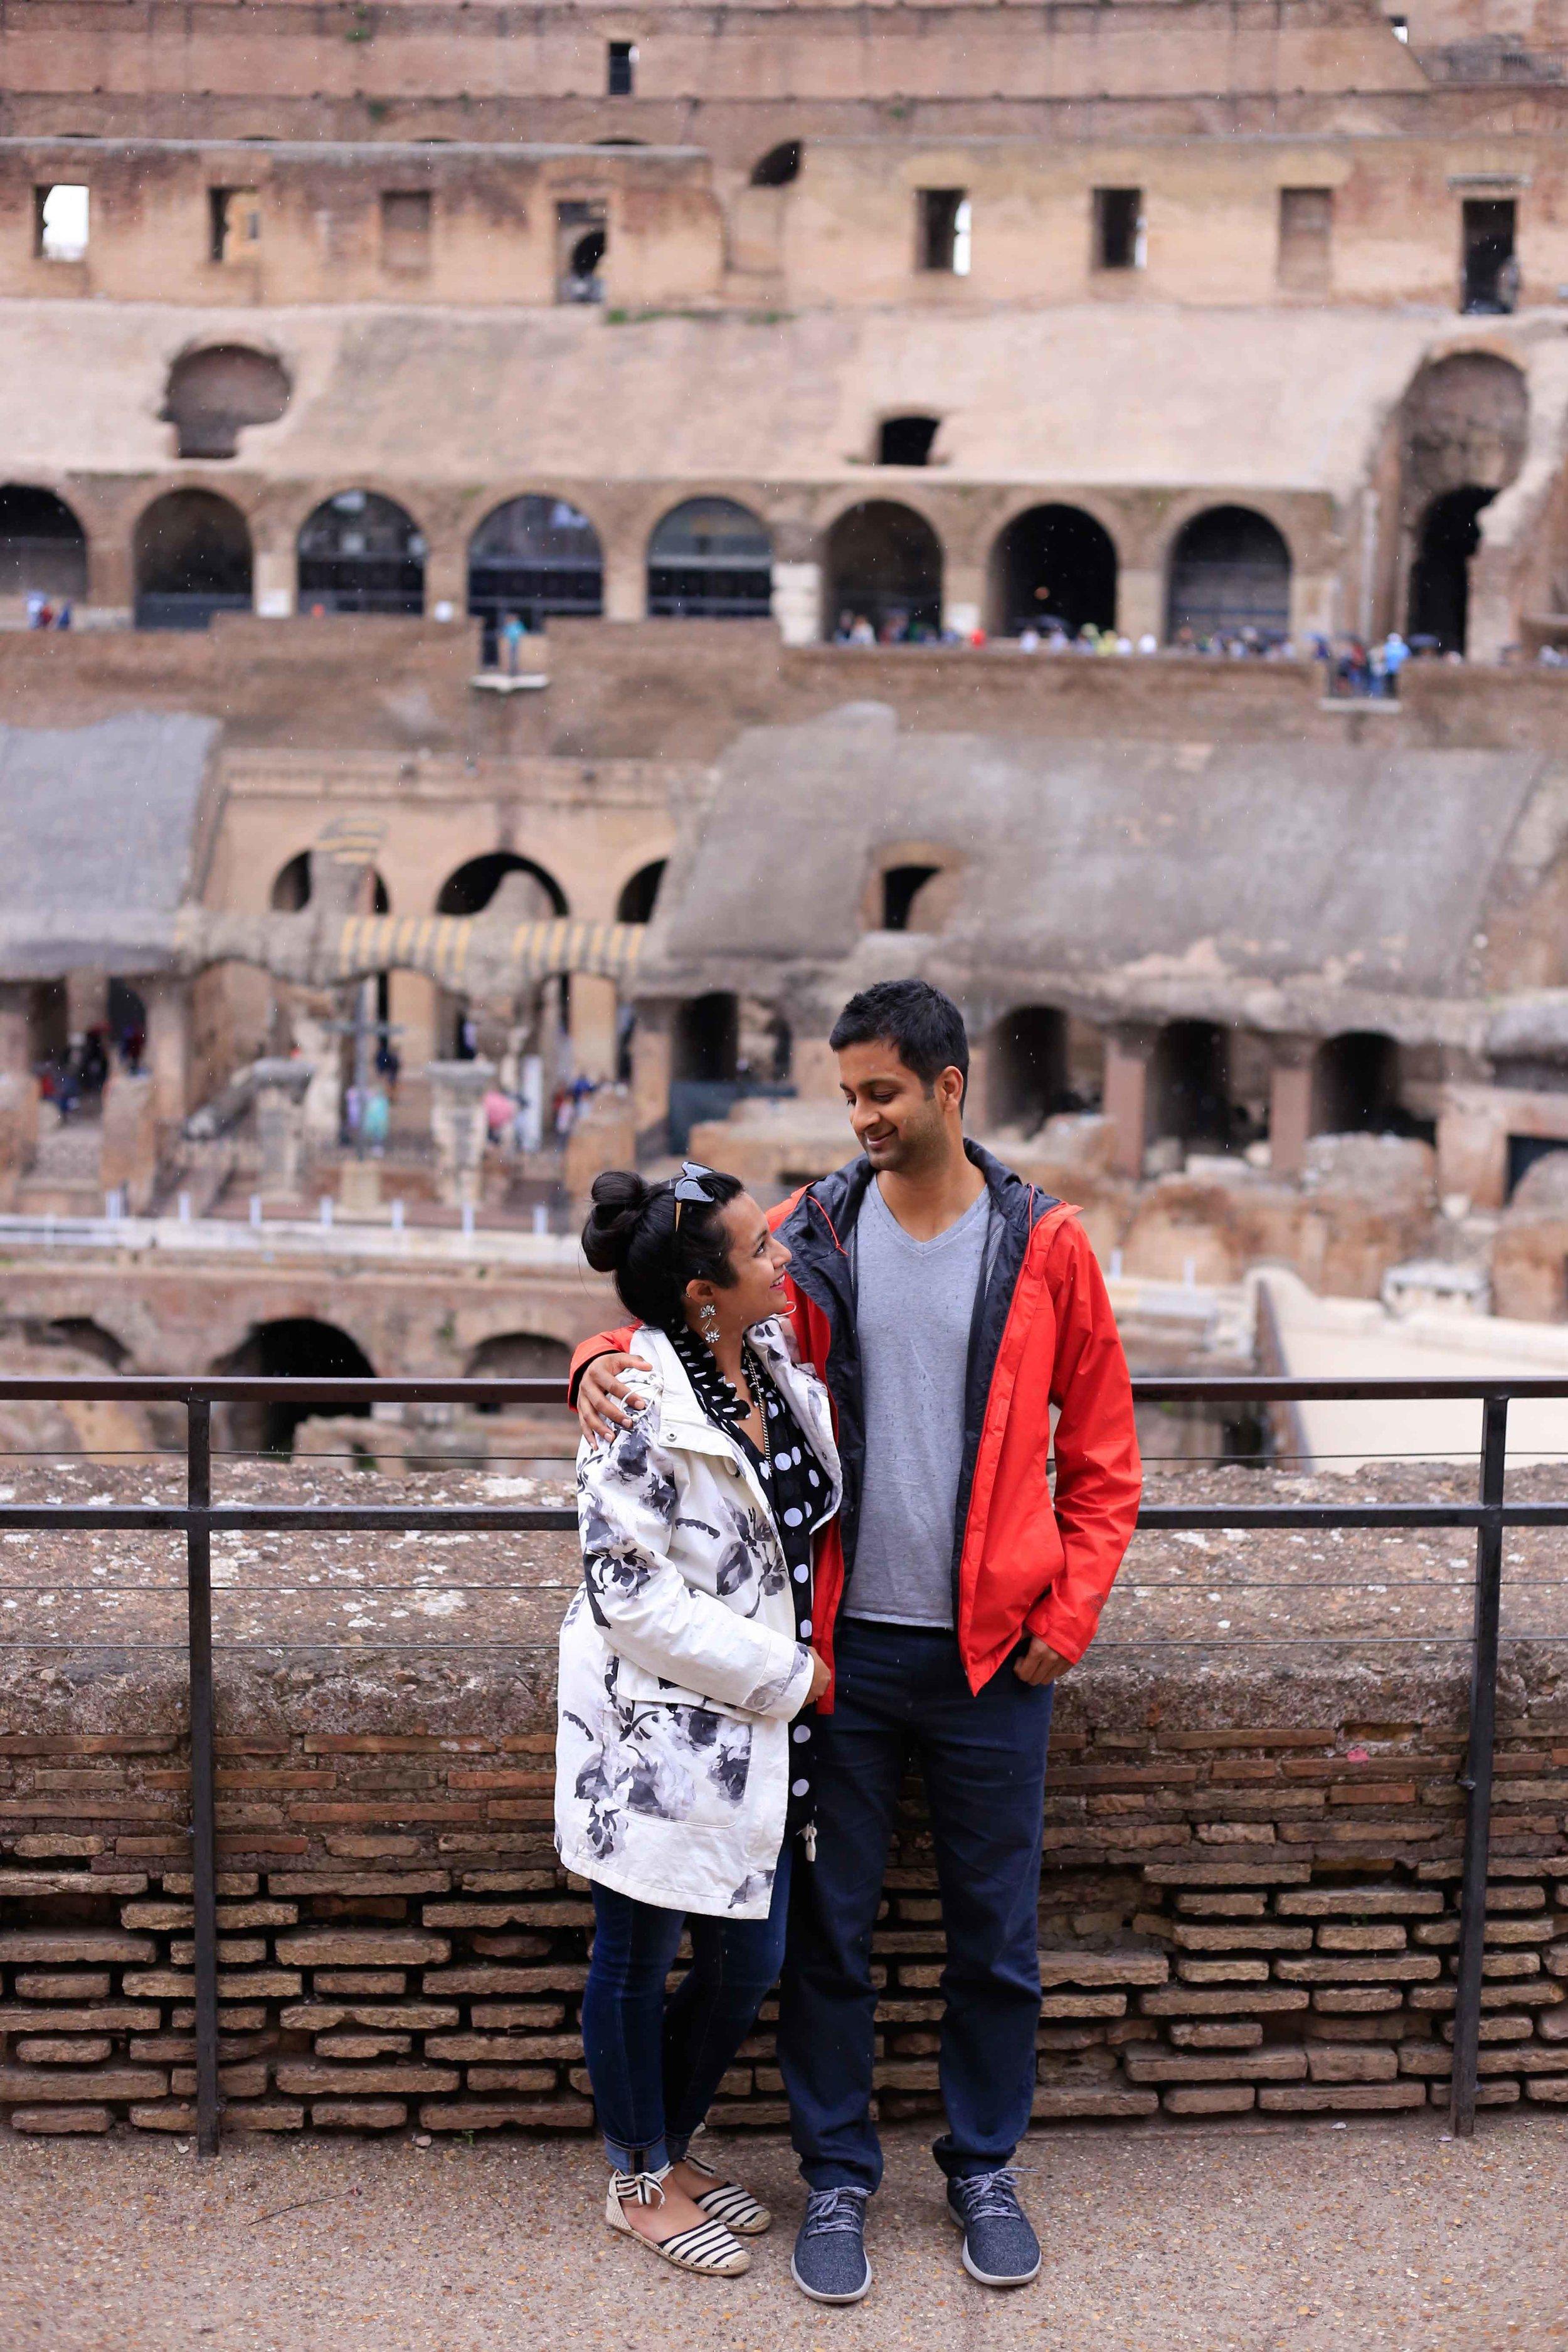 Colosseum Guide Roadtrip through Italy Tuscany Travel Guide Charisma Shah